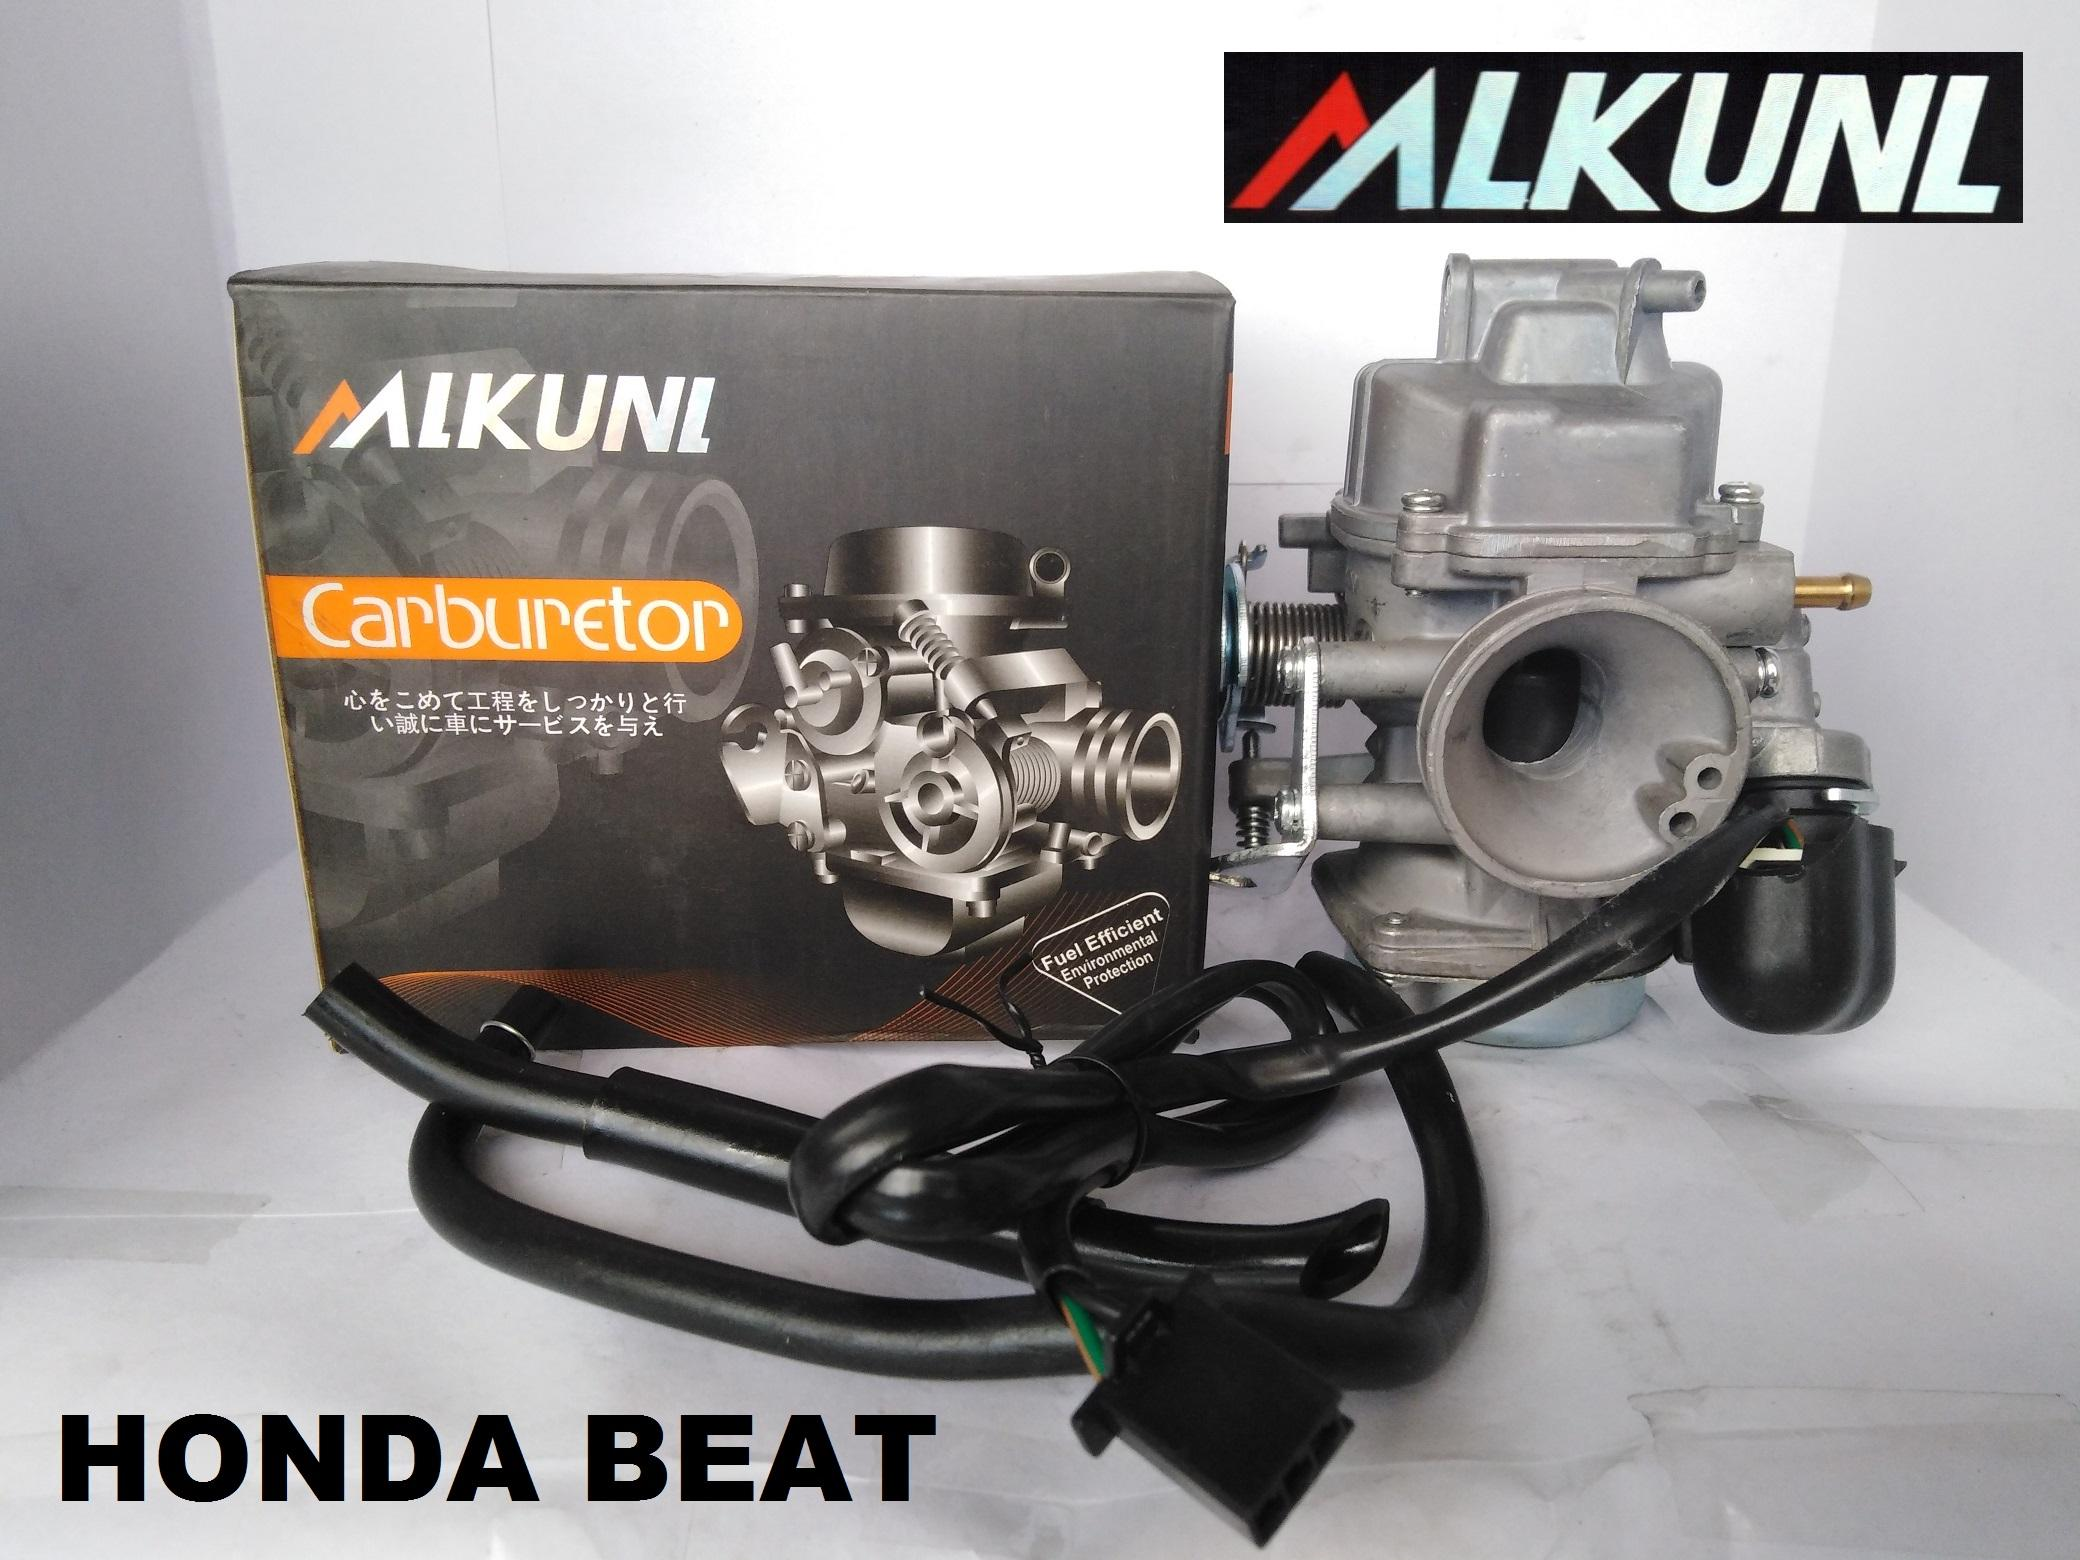 Motorcycle Carburator Assembly - Honda Beat